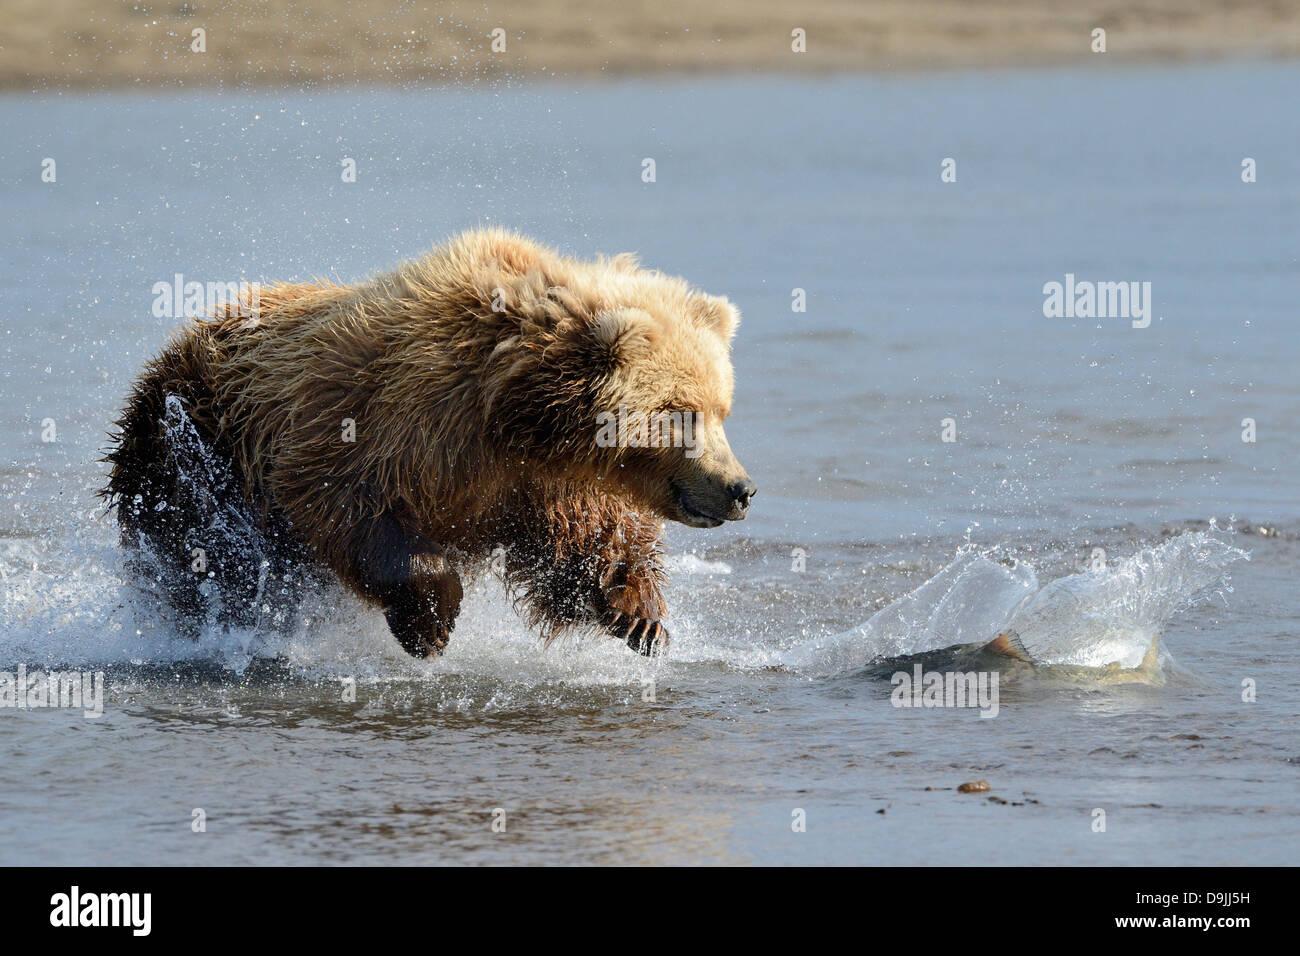 Grizzly Bear jumping at fish - Stock Image